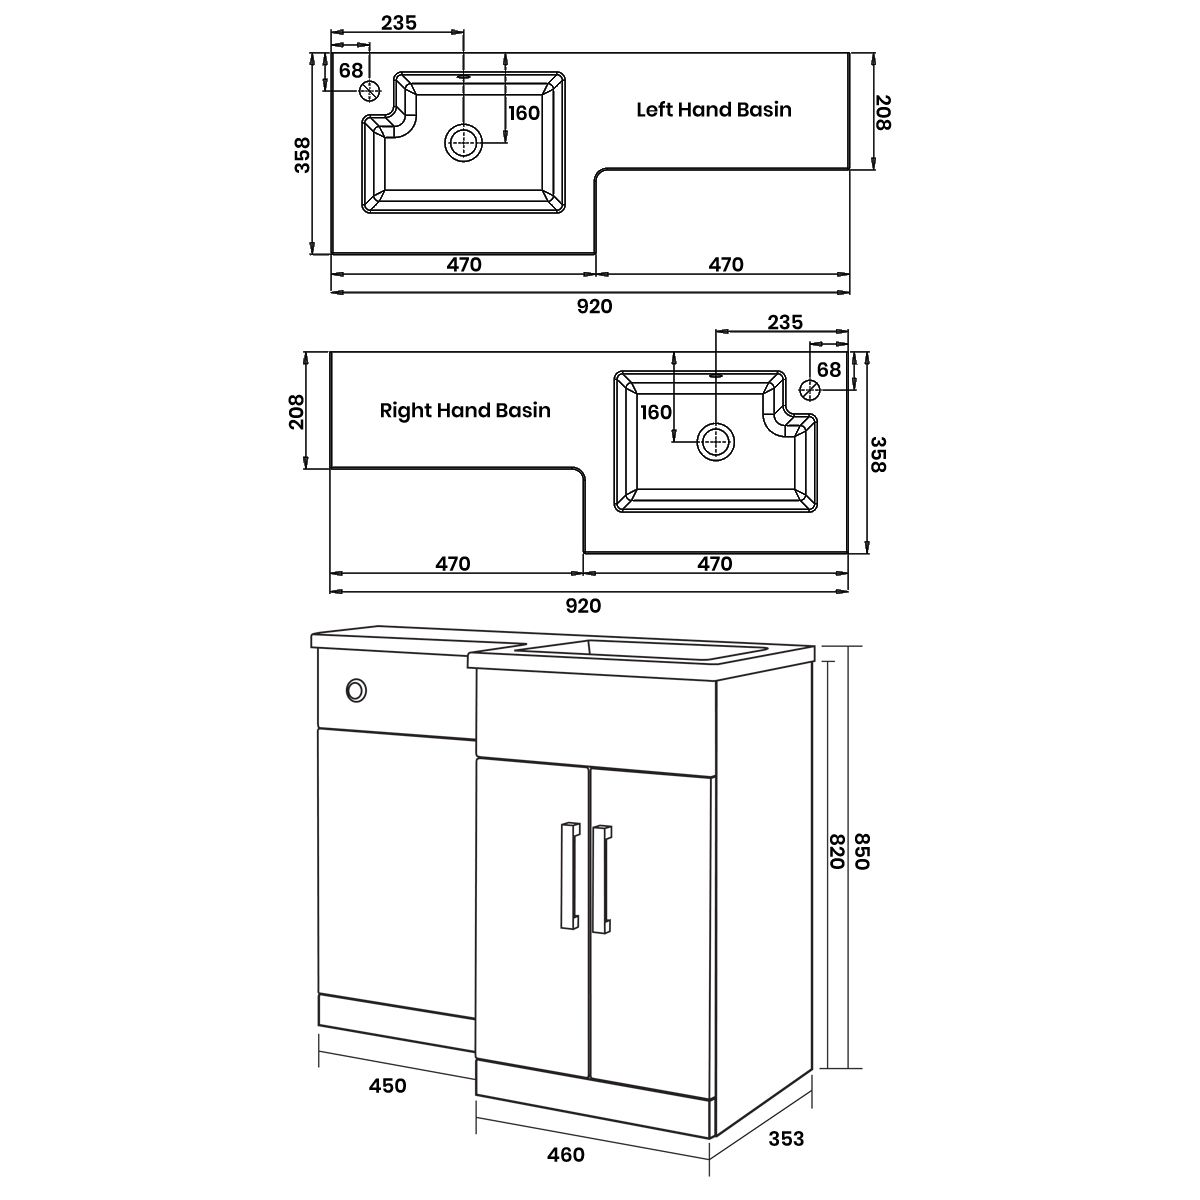 Elation Compact Combination L Shape Bardolino Oak Furniture Pack 920mm Dimensions